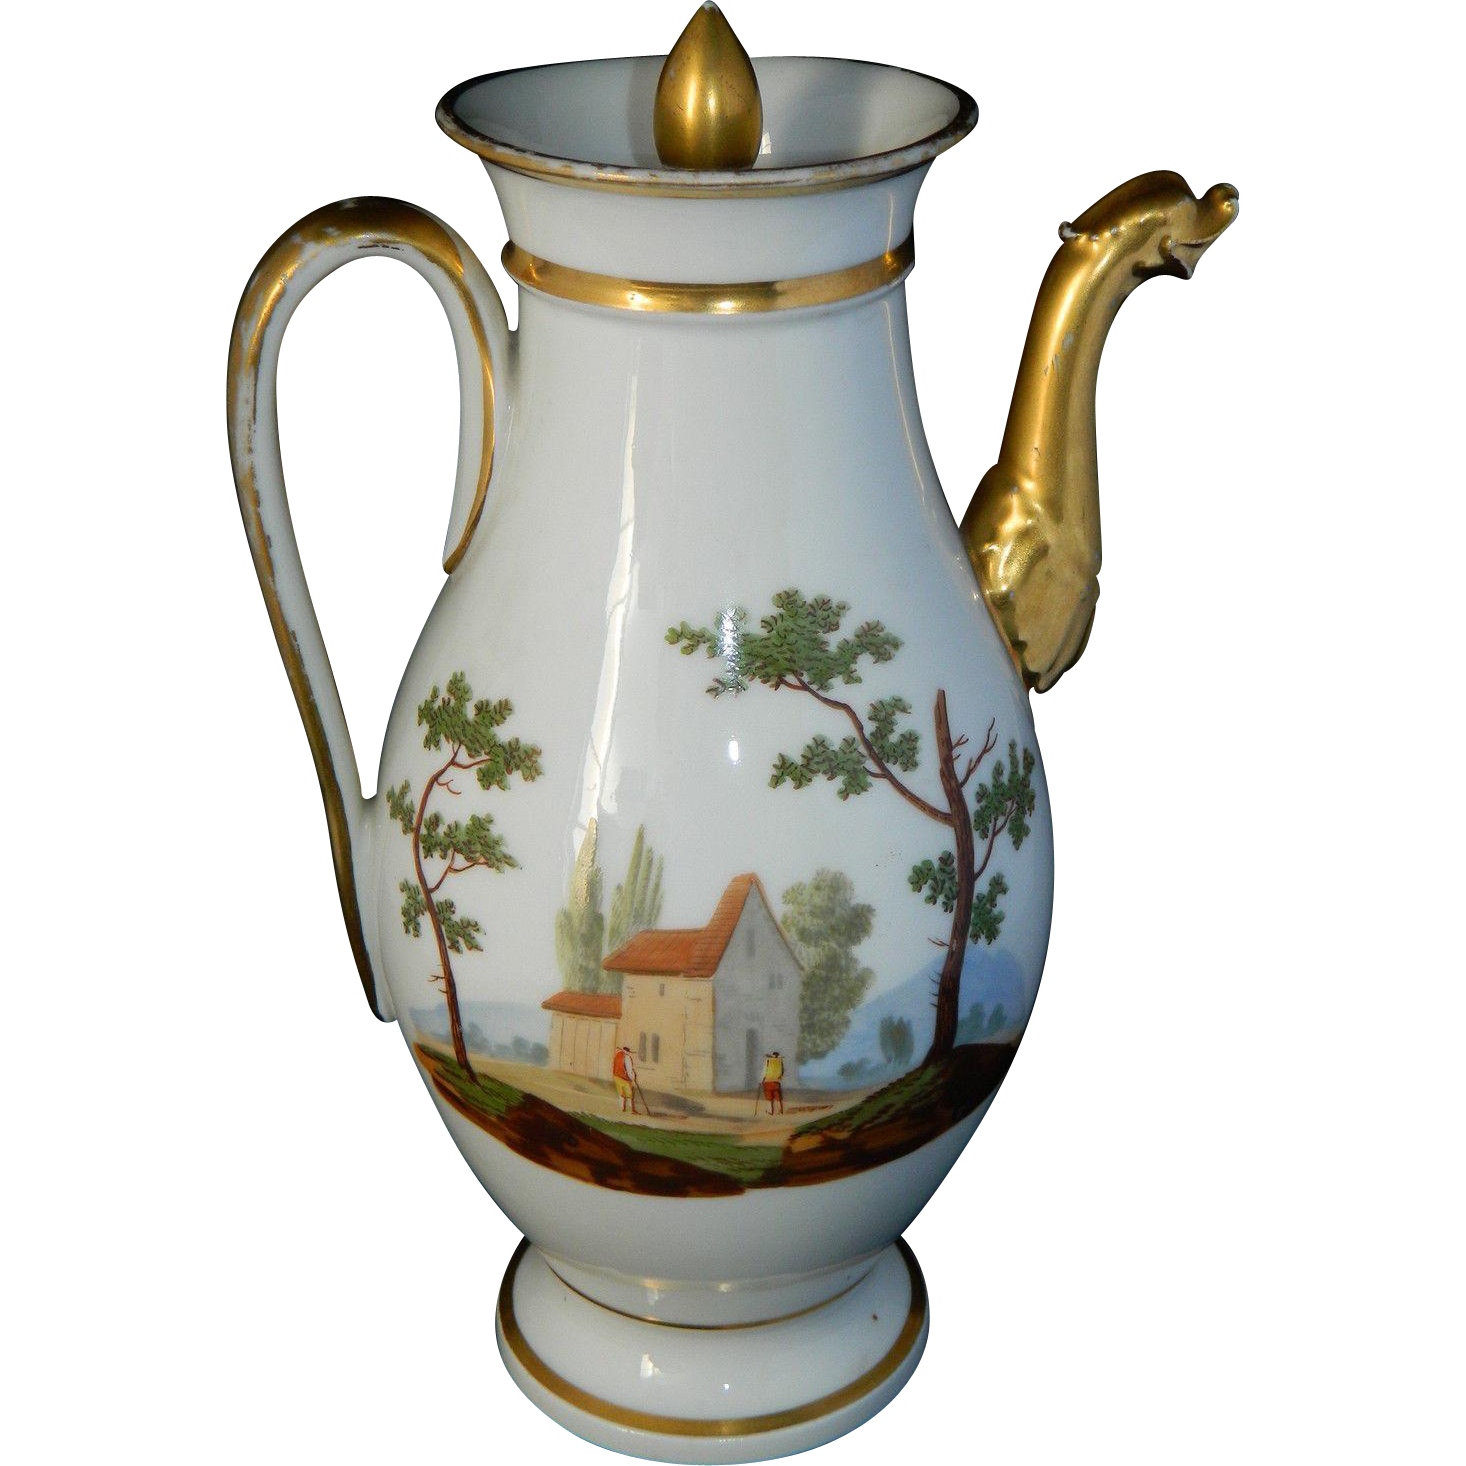 Antique 1820 French Old Paris Empire era hand painted